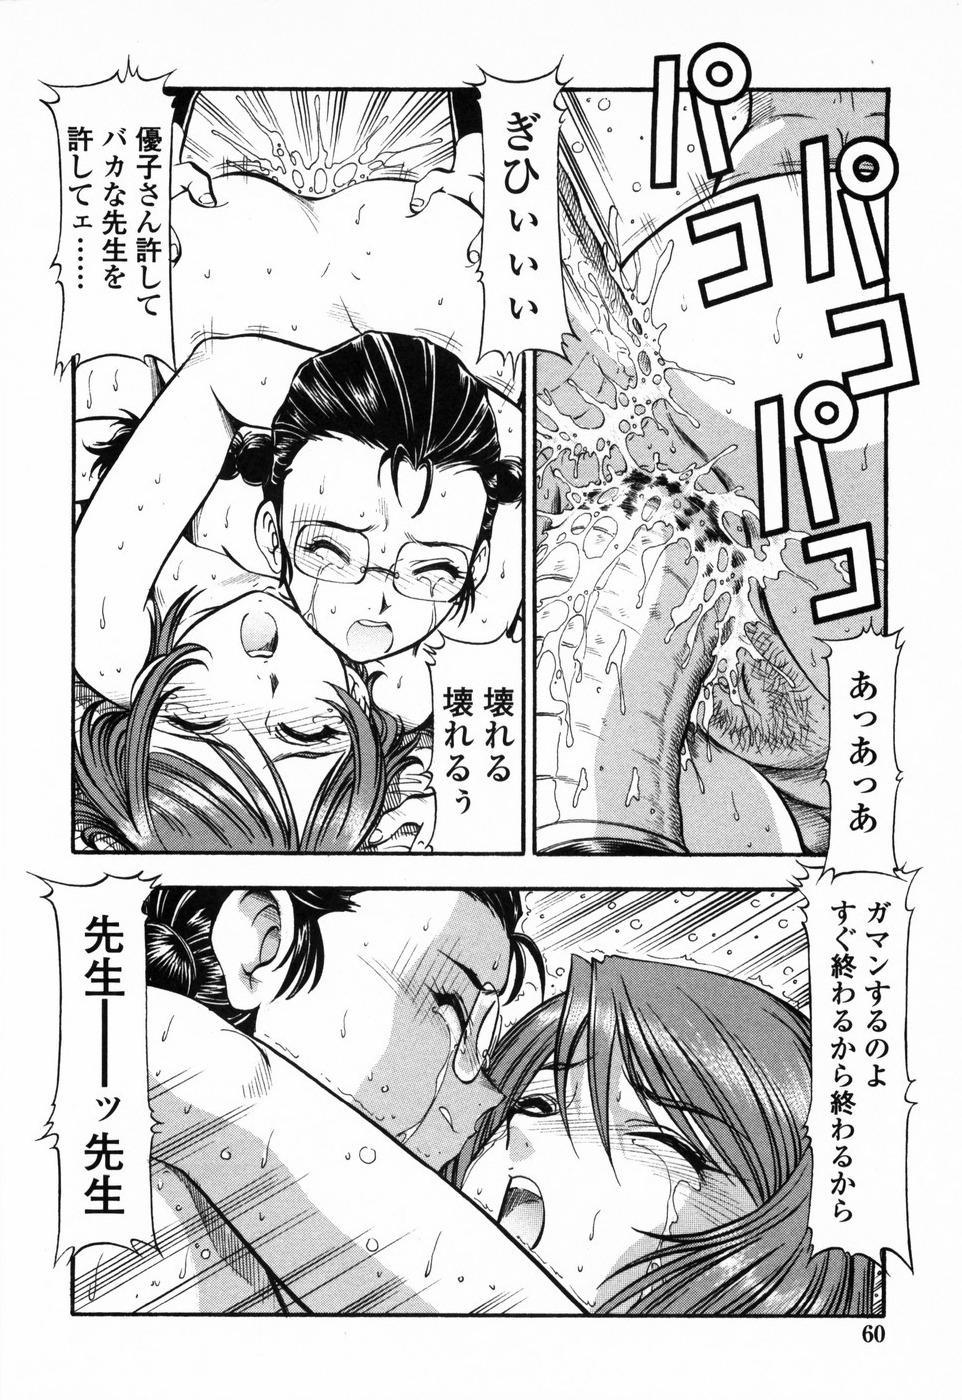 Kichiku Houteishiki - Equation of brutal person 65